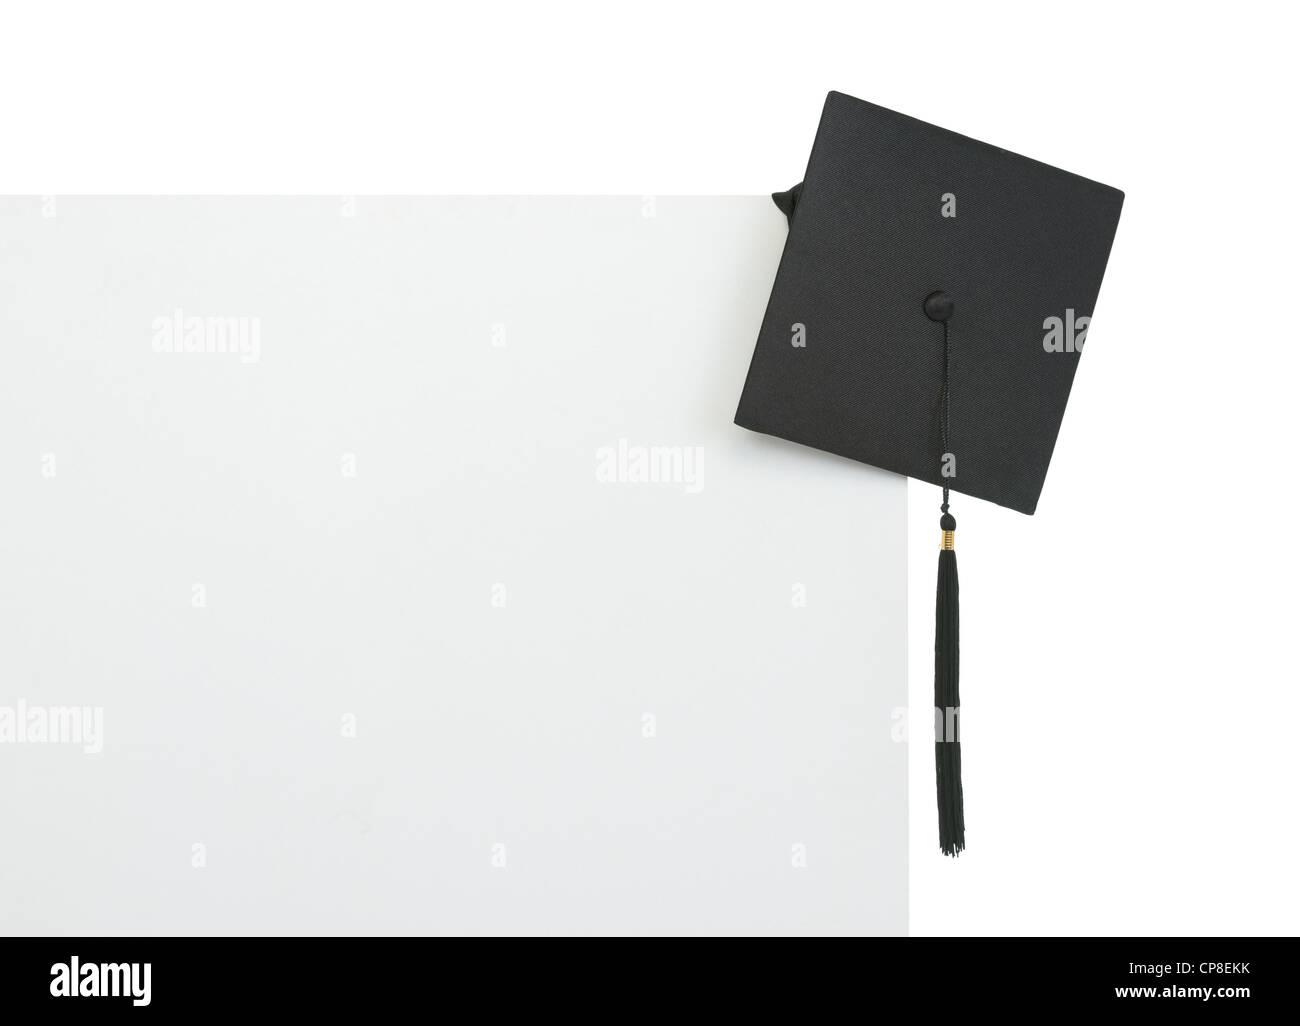 Graduation cap on blank billboard - Stock Image